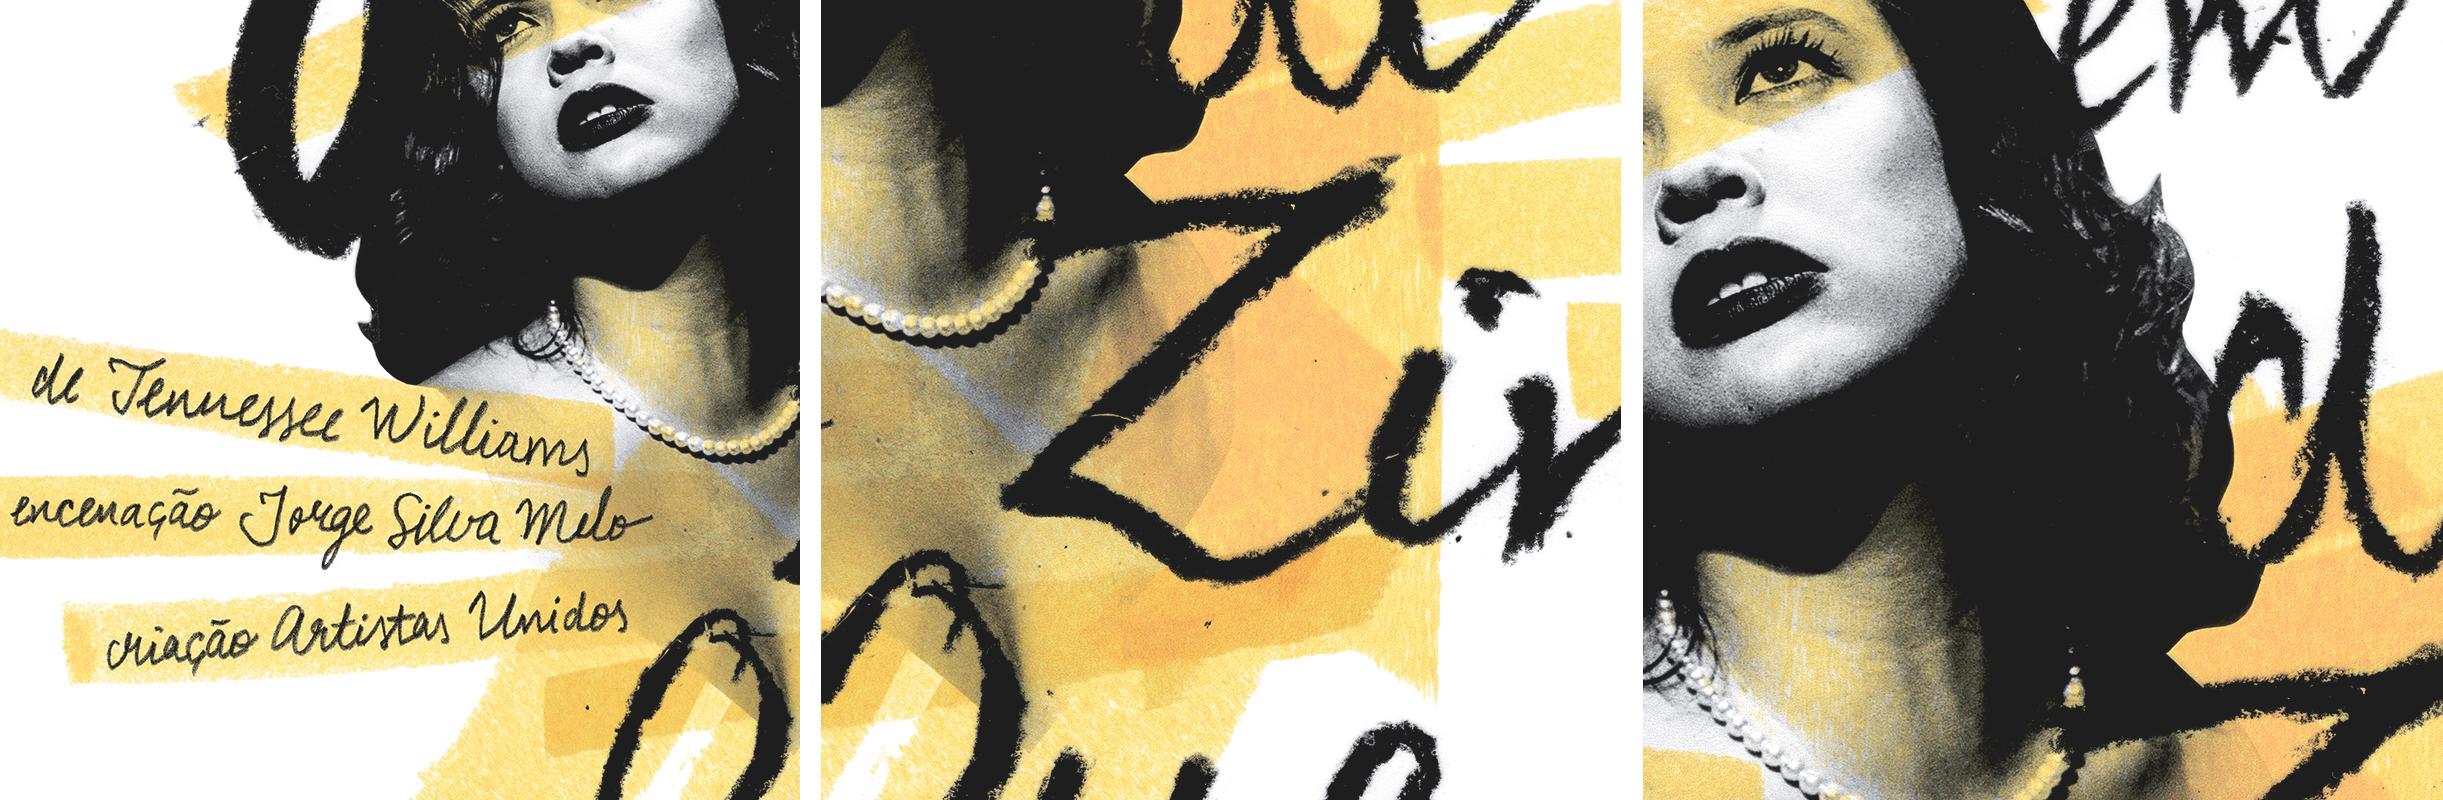 Design-Grafico-Graphic-Design-Cartaz-Poster-Teatro-Nacional-Sao-Joao-TNSJ-Theatre-Play-Handmade-Typography-Tipografia-01-bonjourmolotov.jpg